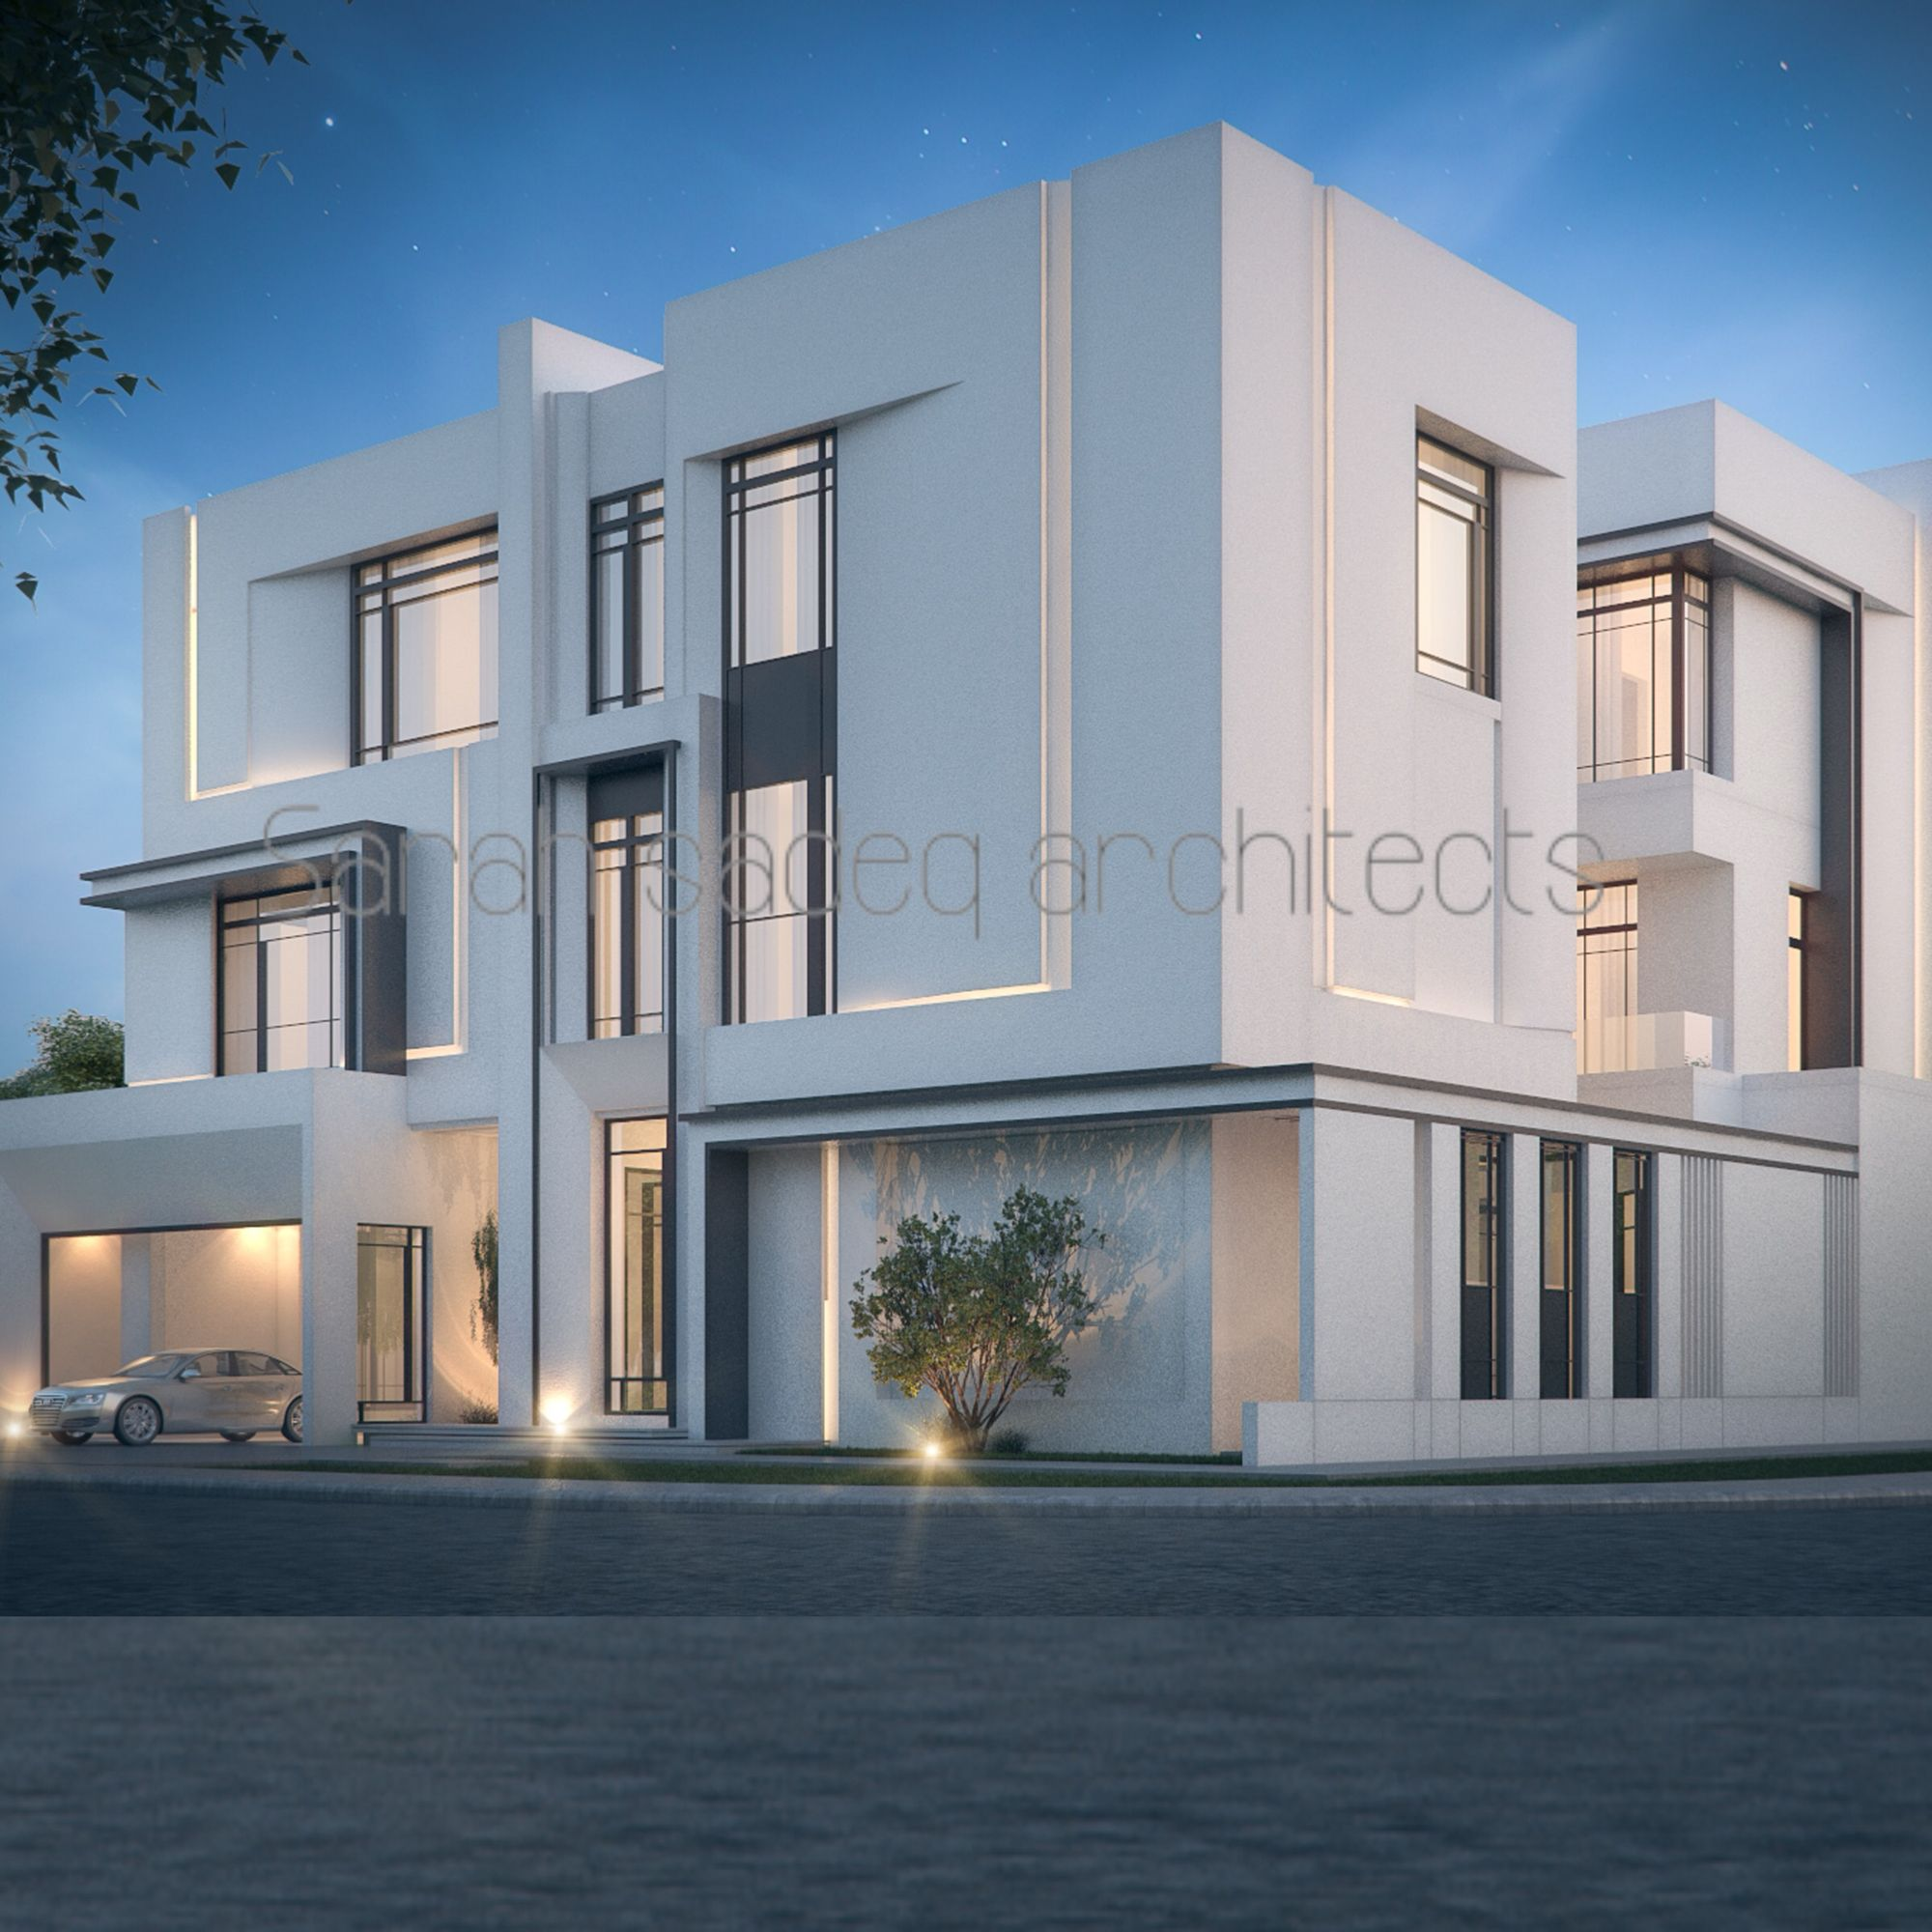 private villa 600 m kuwait sarah sadeq architects sarah sadeq architectes pinterest. Black Bedroom Furniture Sets. Home Design Ideas